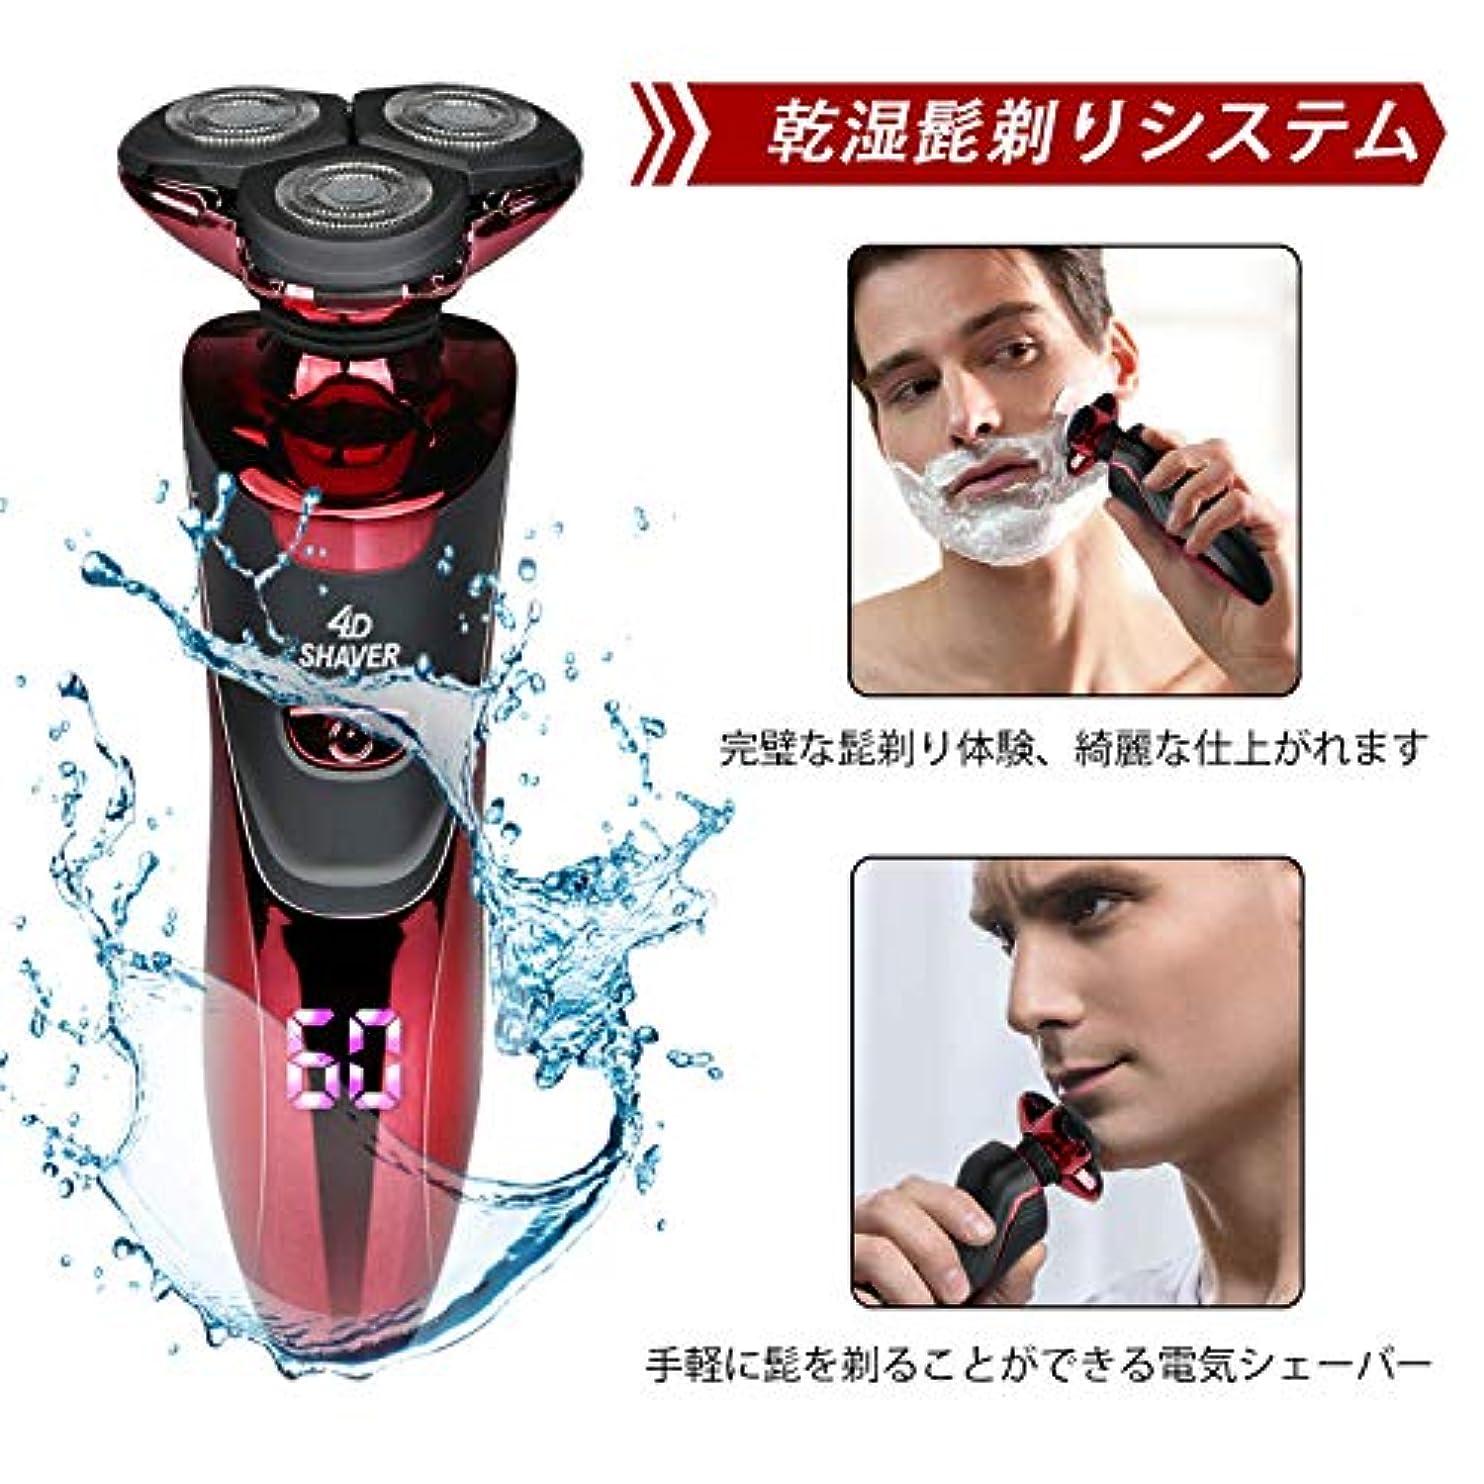 4in1多機能 3枚刃 回転式シェーバー IPX7防水鼻毛カッター/洗顔ブラシ 乾湿両用 LEDディスプレイ 切れ味最高 安全ロック機能